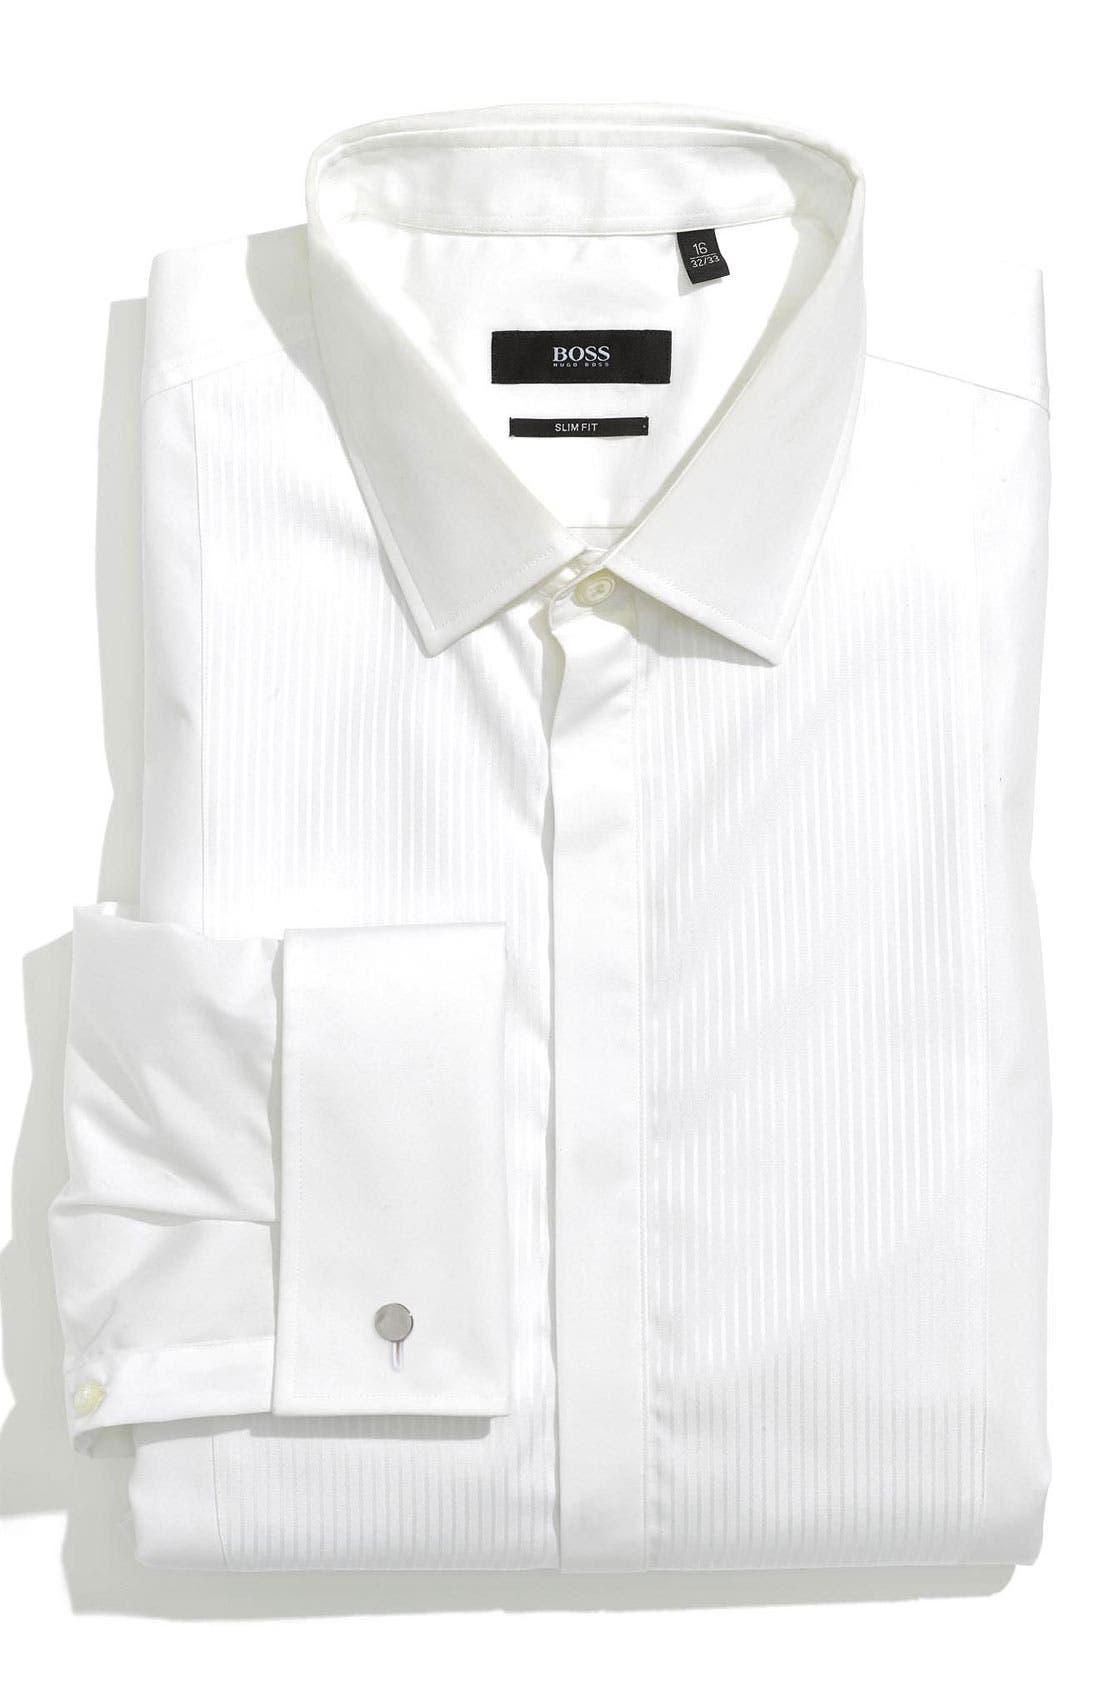 BOSS HUGO BOSS 'Jason' Slim Fit Tuxedo Shirt, Main, color, 100